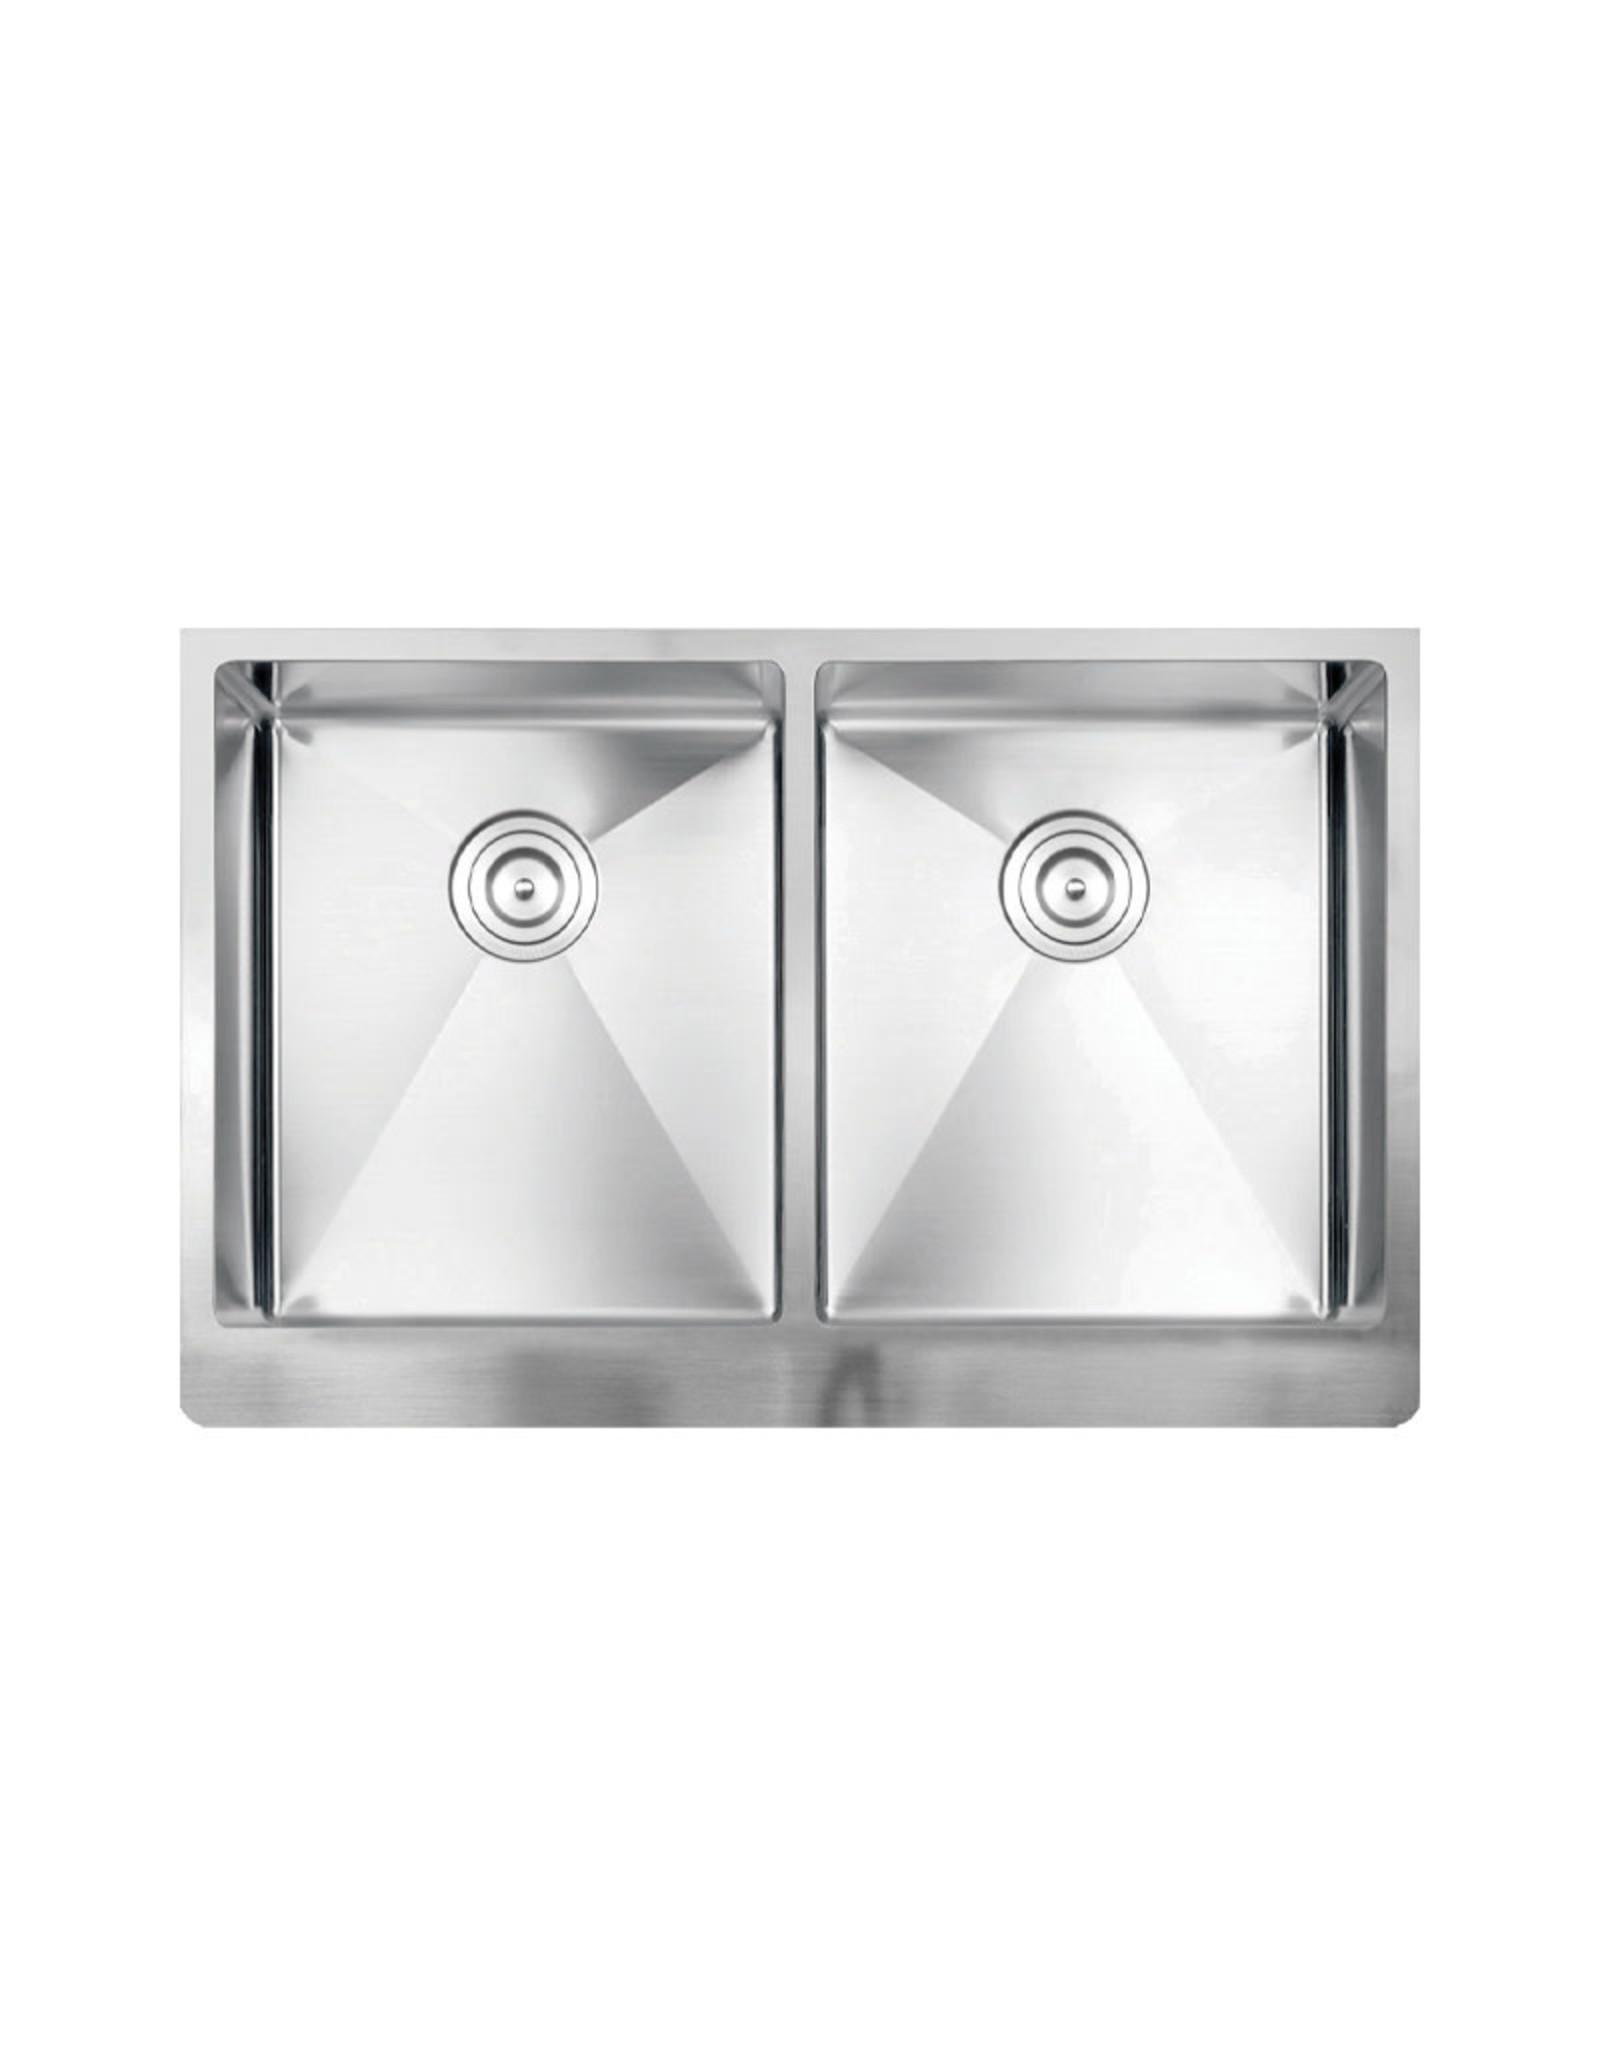 "Vogt Klagenfurt 16R Apron Front Kitchen Sink Double Bowl (50/50) 32 ⅞"" x 19 1/2 "" x 10"" With Bottom Grates"